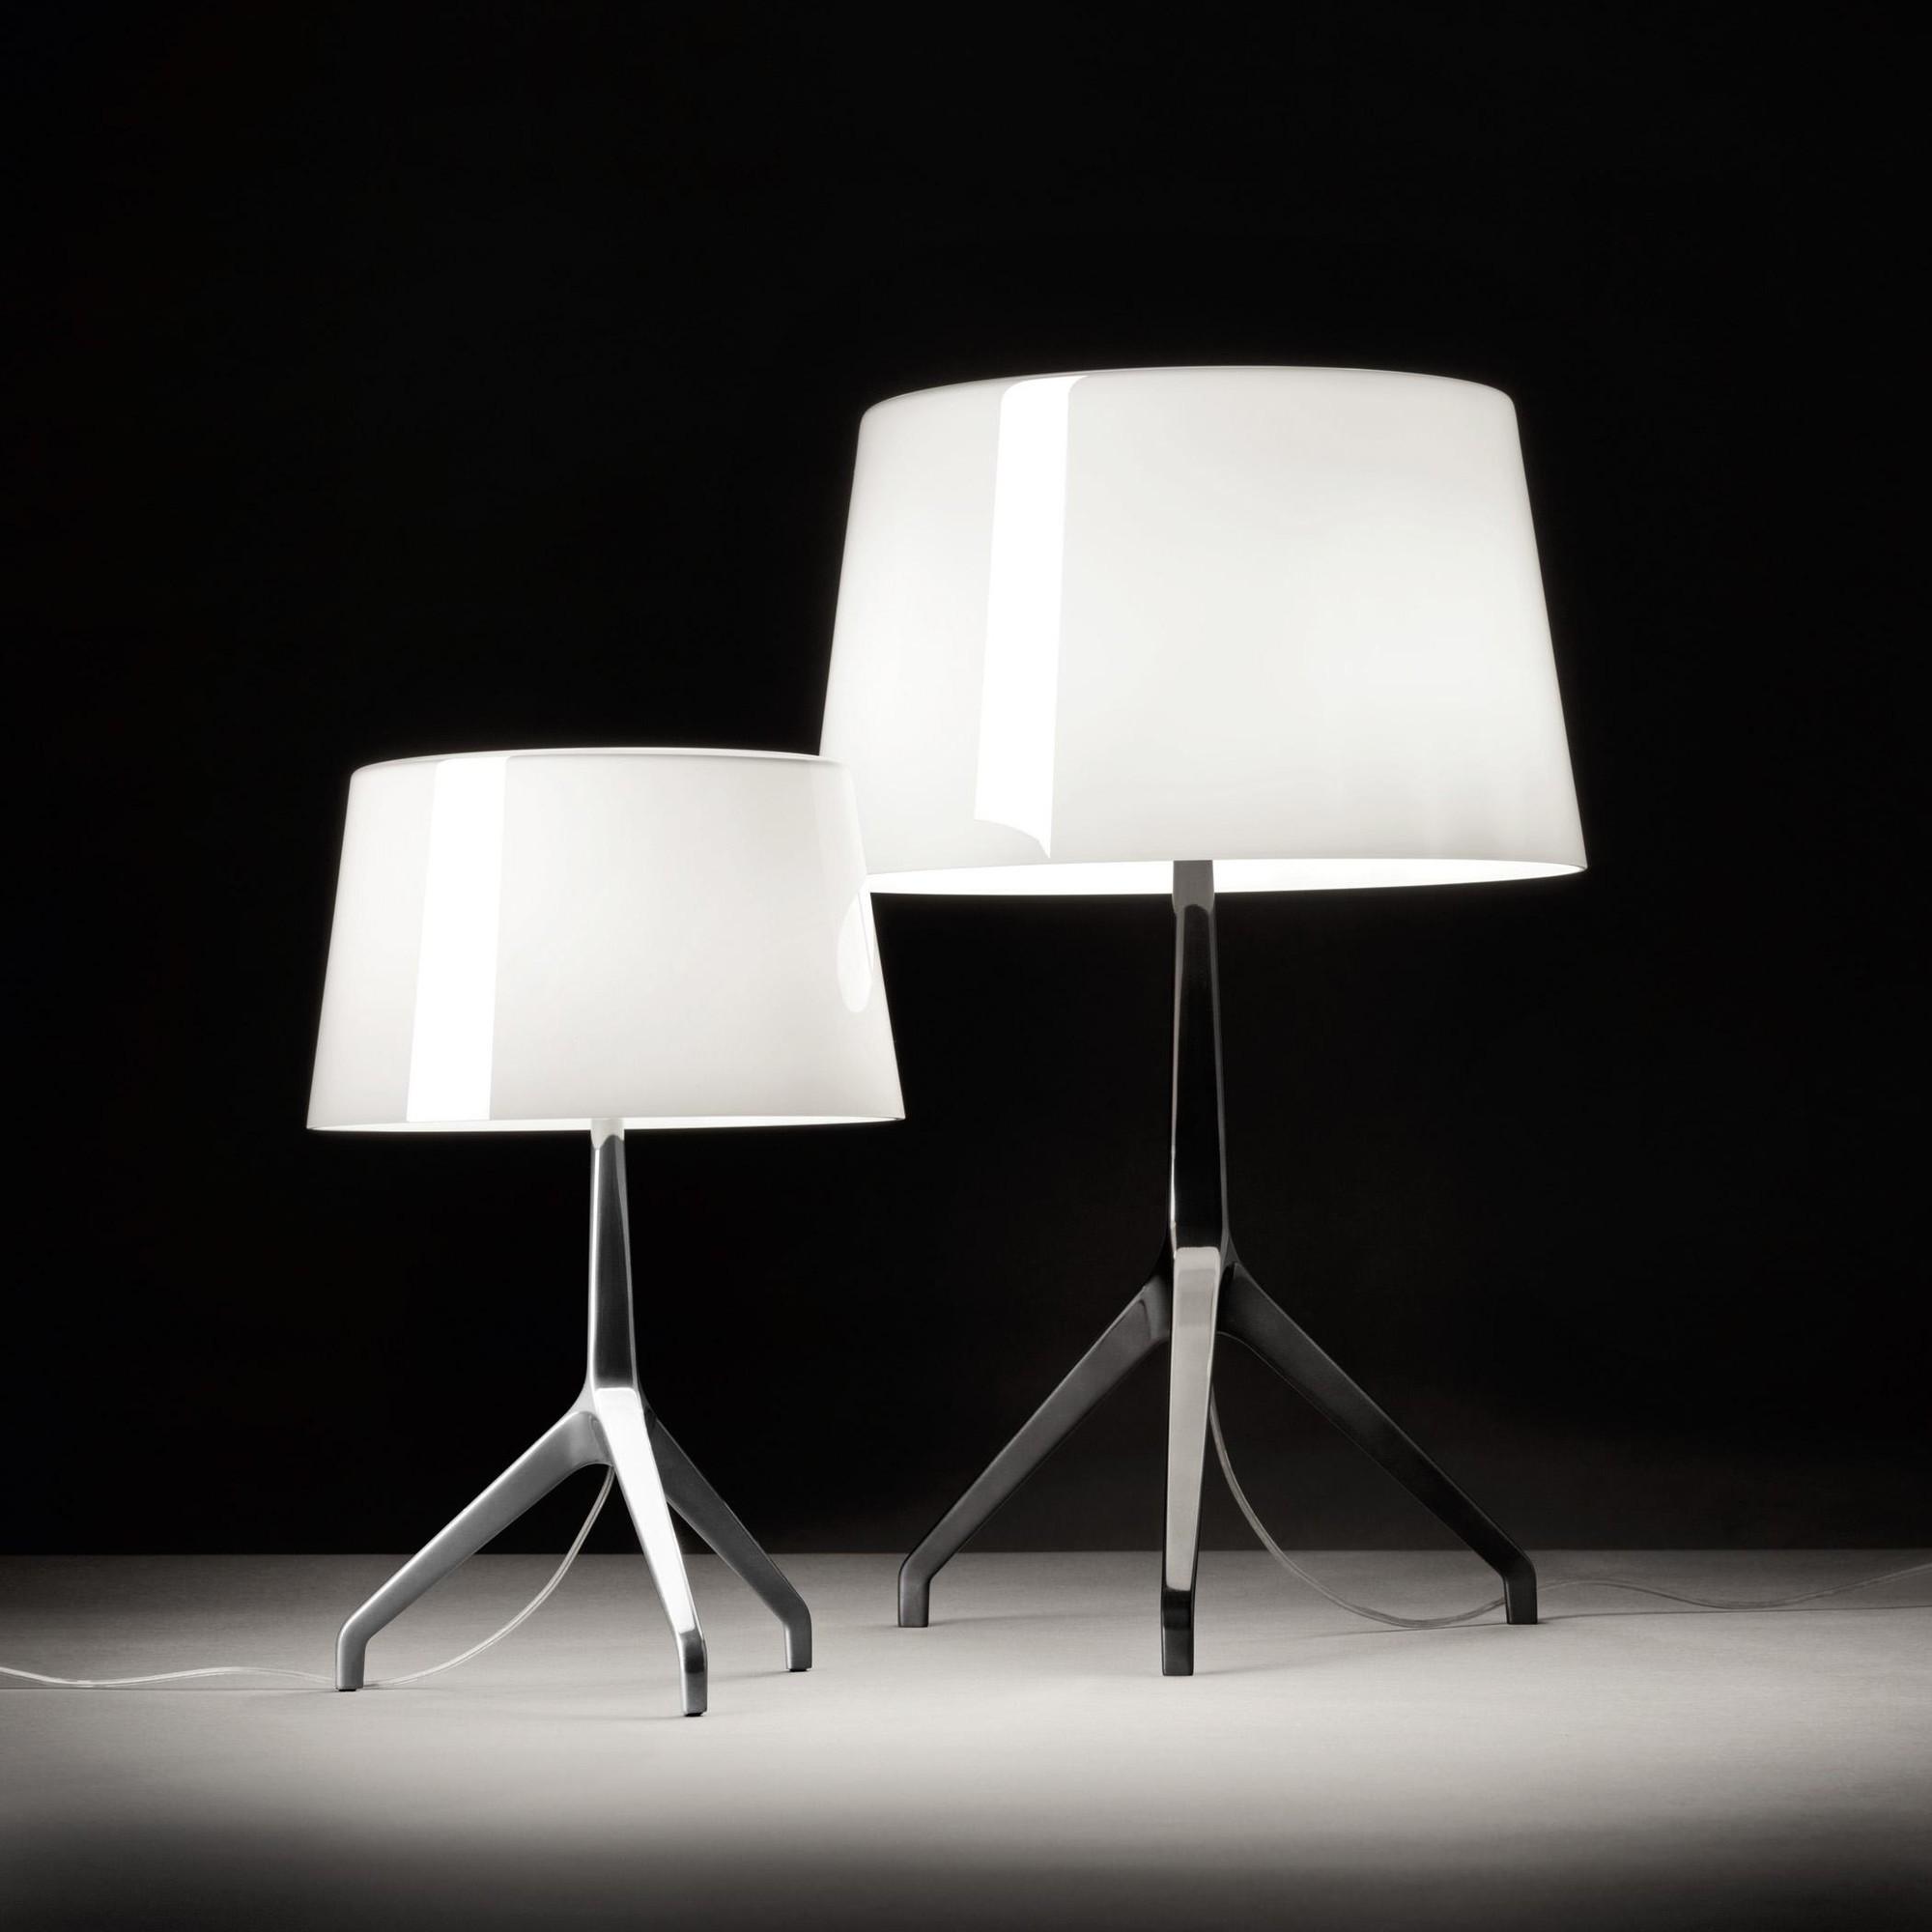 Lumiere Lampe Table Xxl Chrome De NZ8nXOPk0w